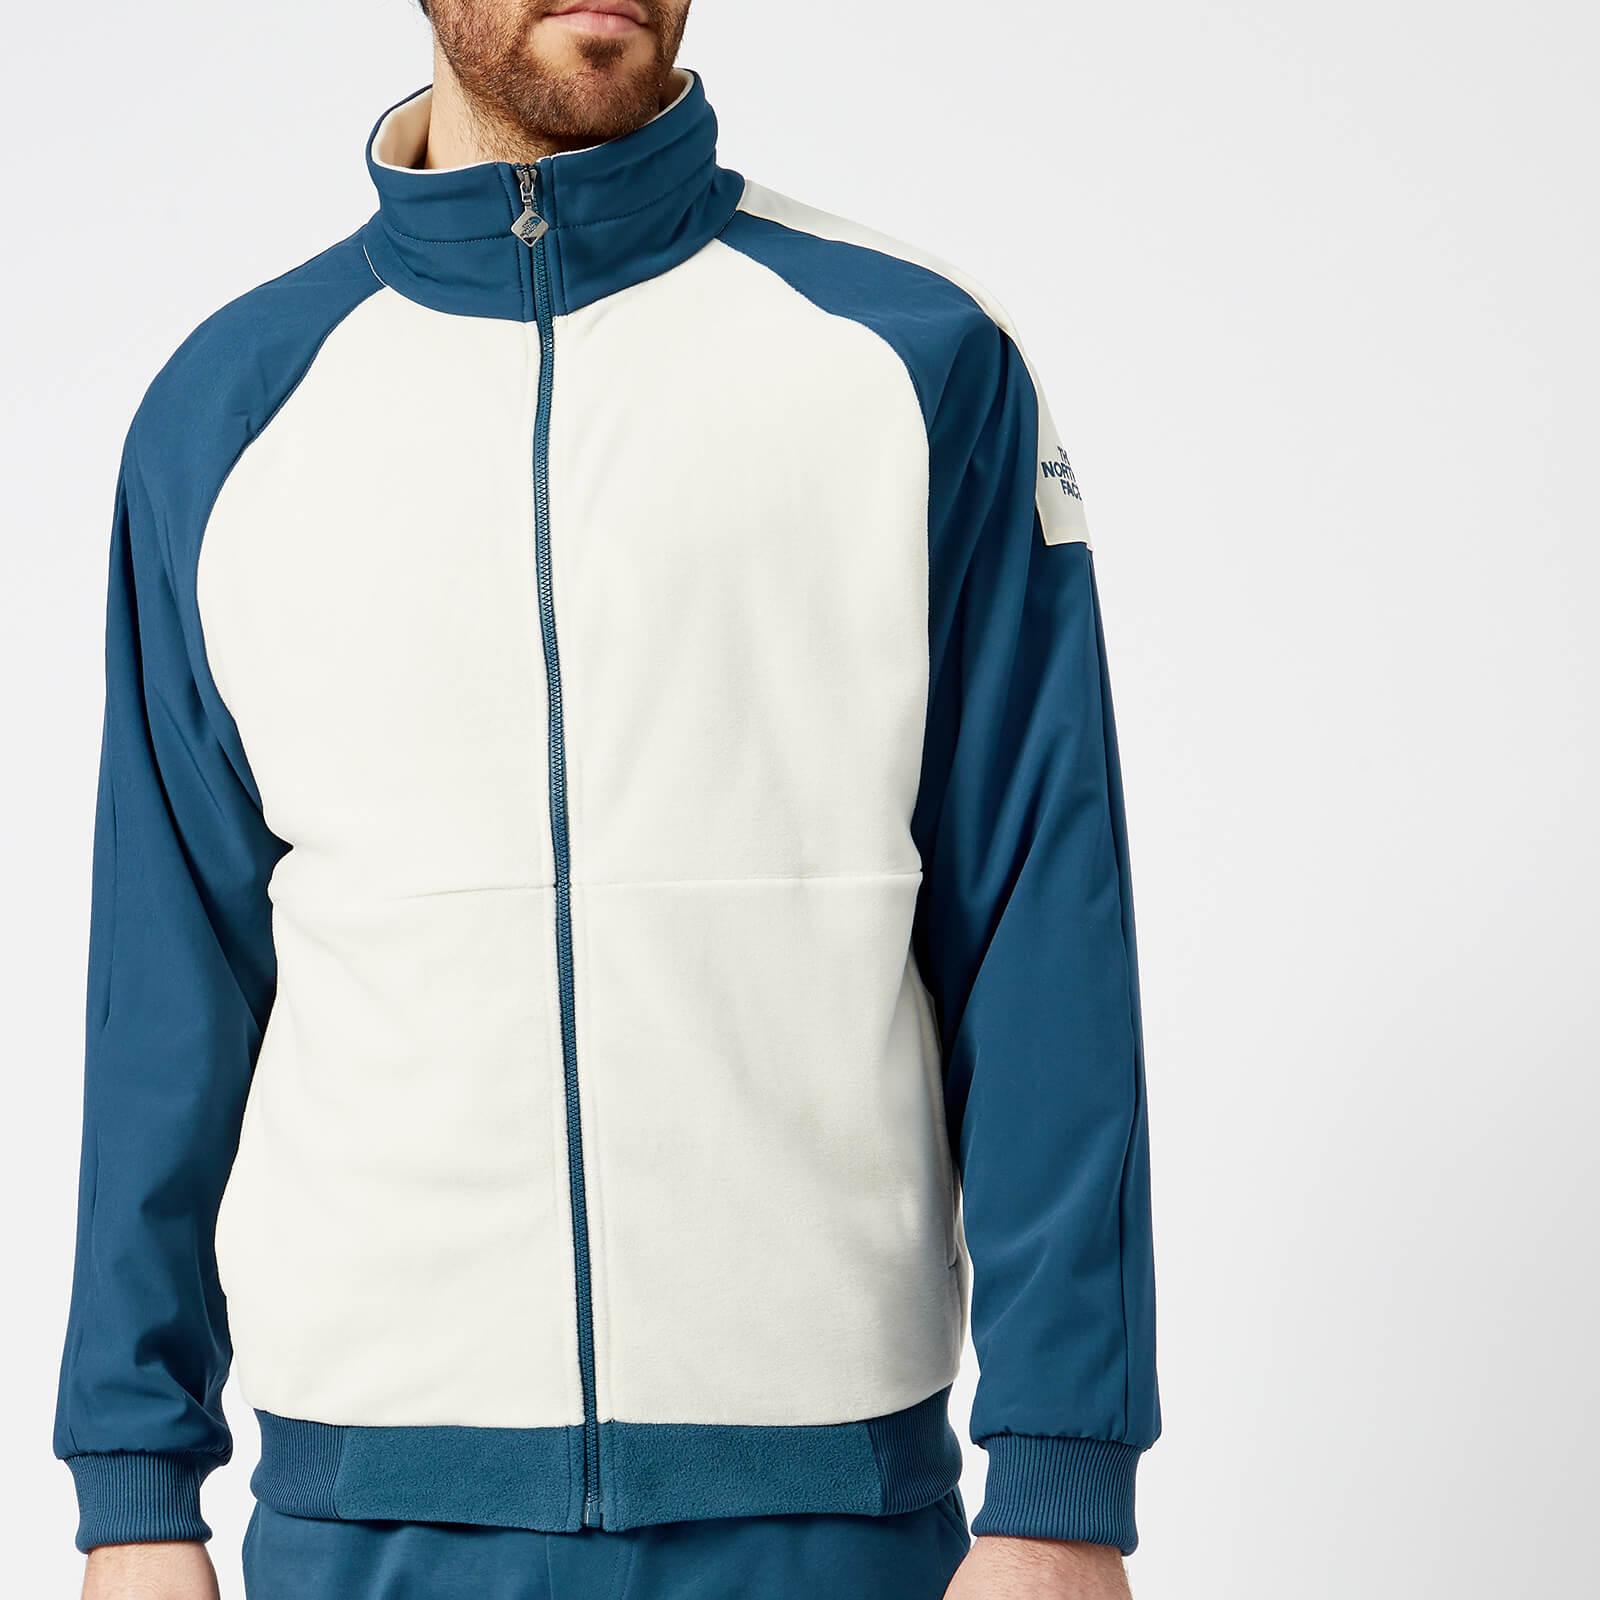 The North Face 1990 Staff Fleece Jacket